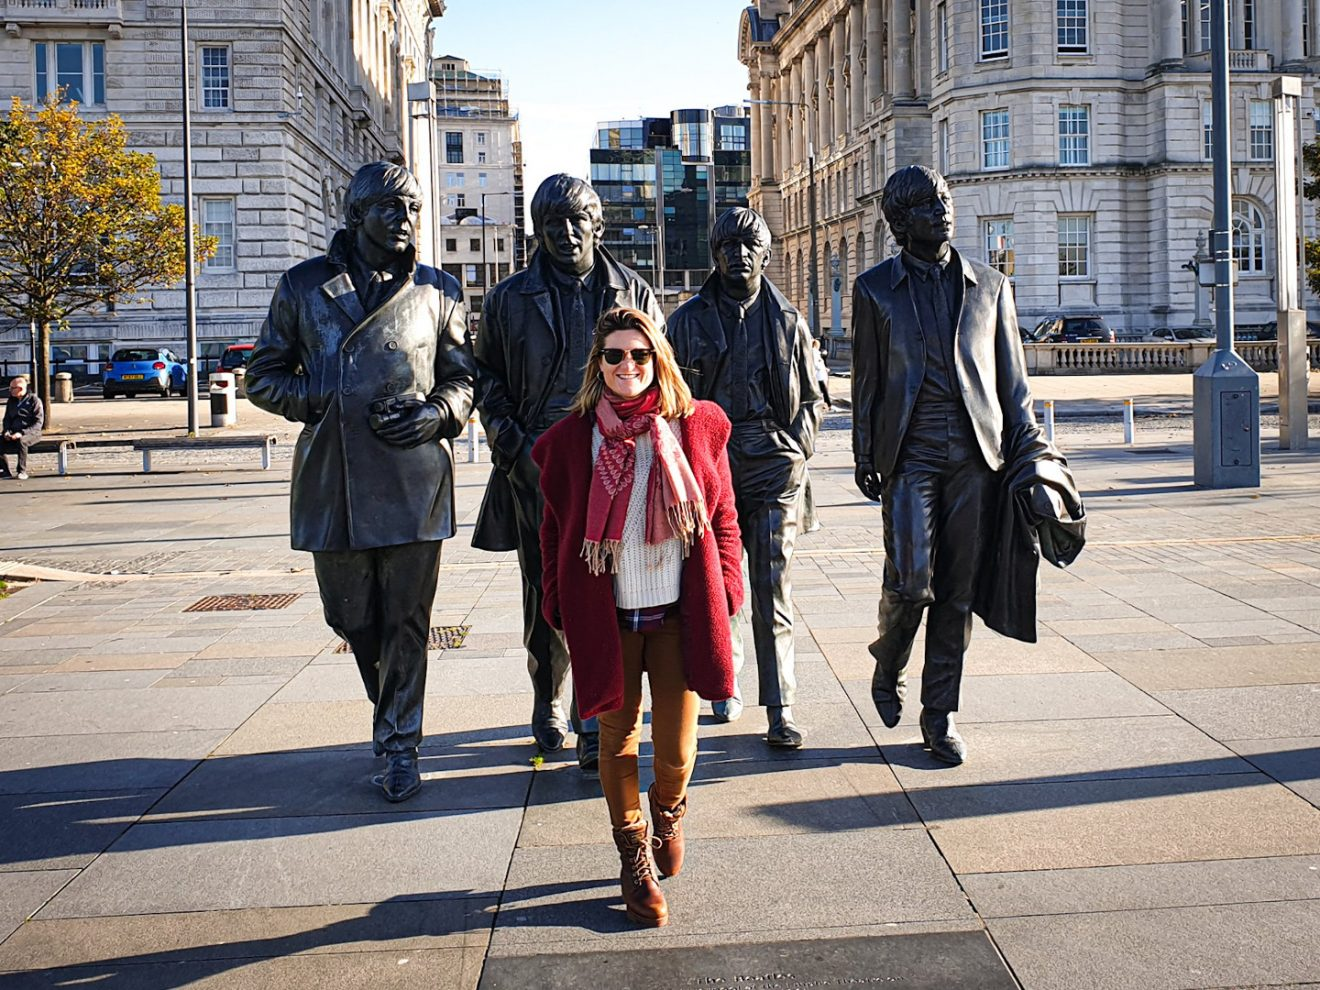 The Beatles Statue que hacer en Liverpool